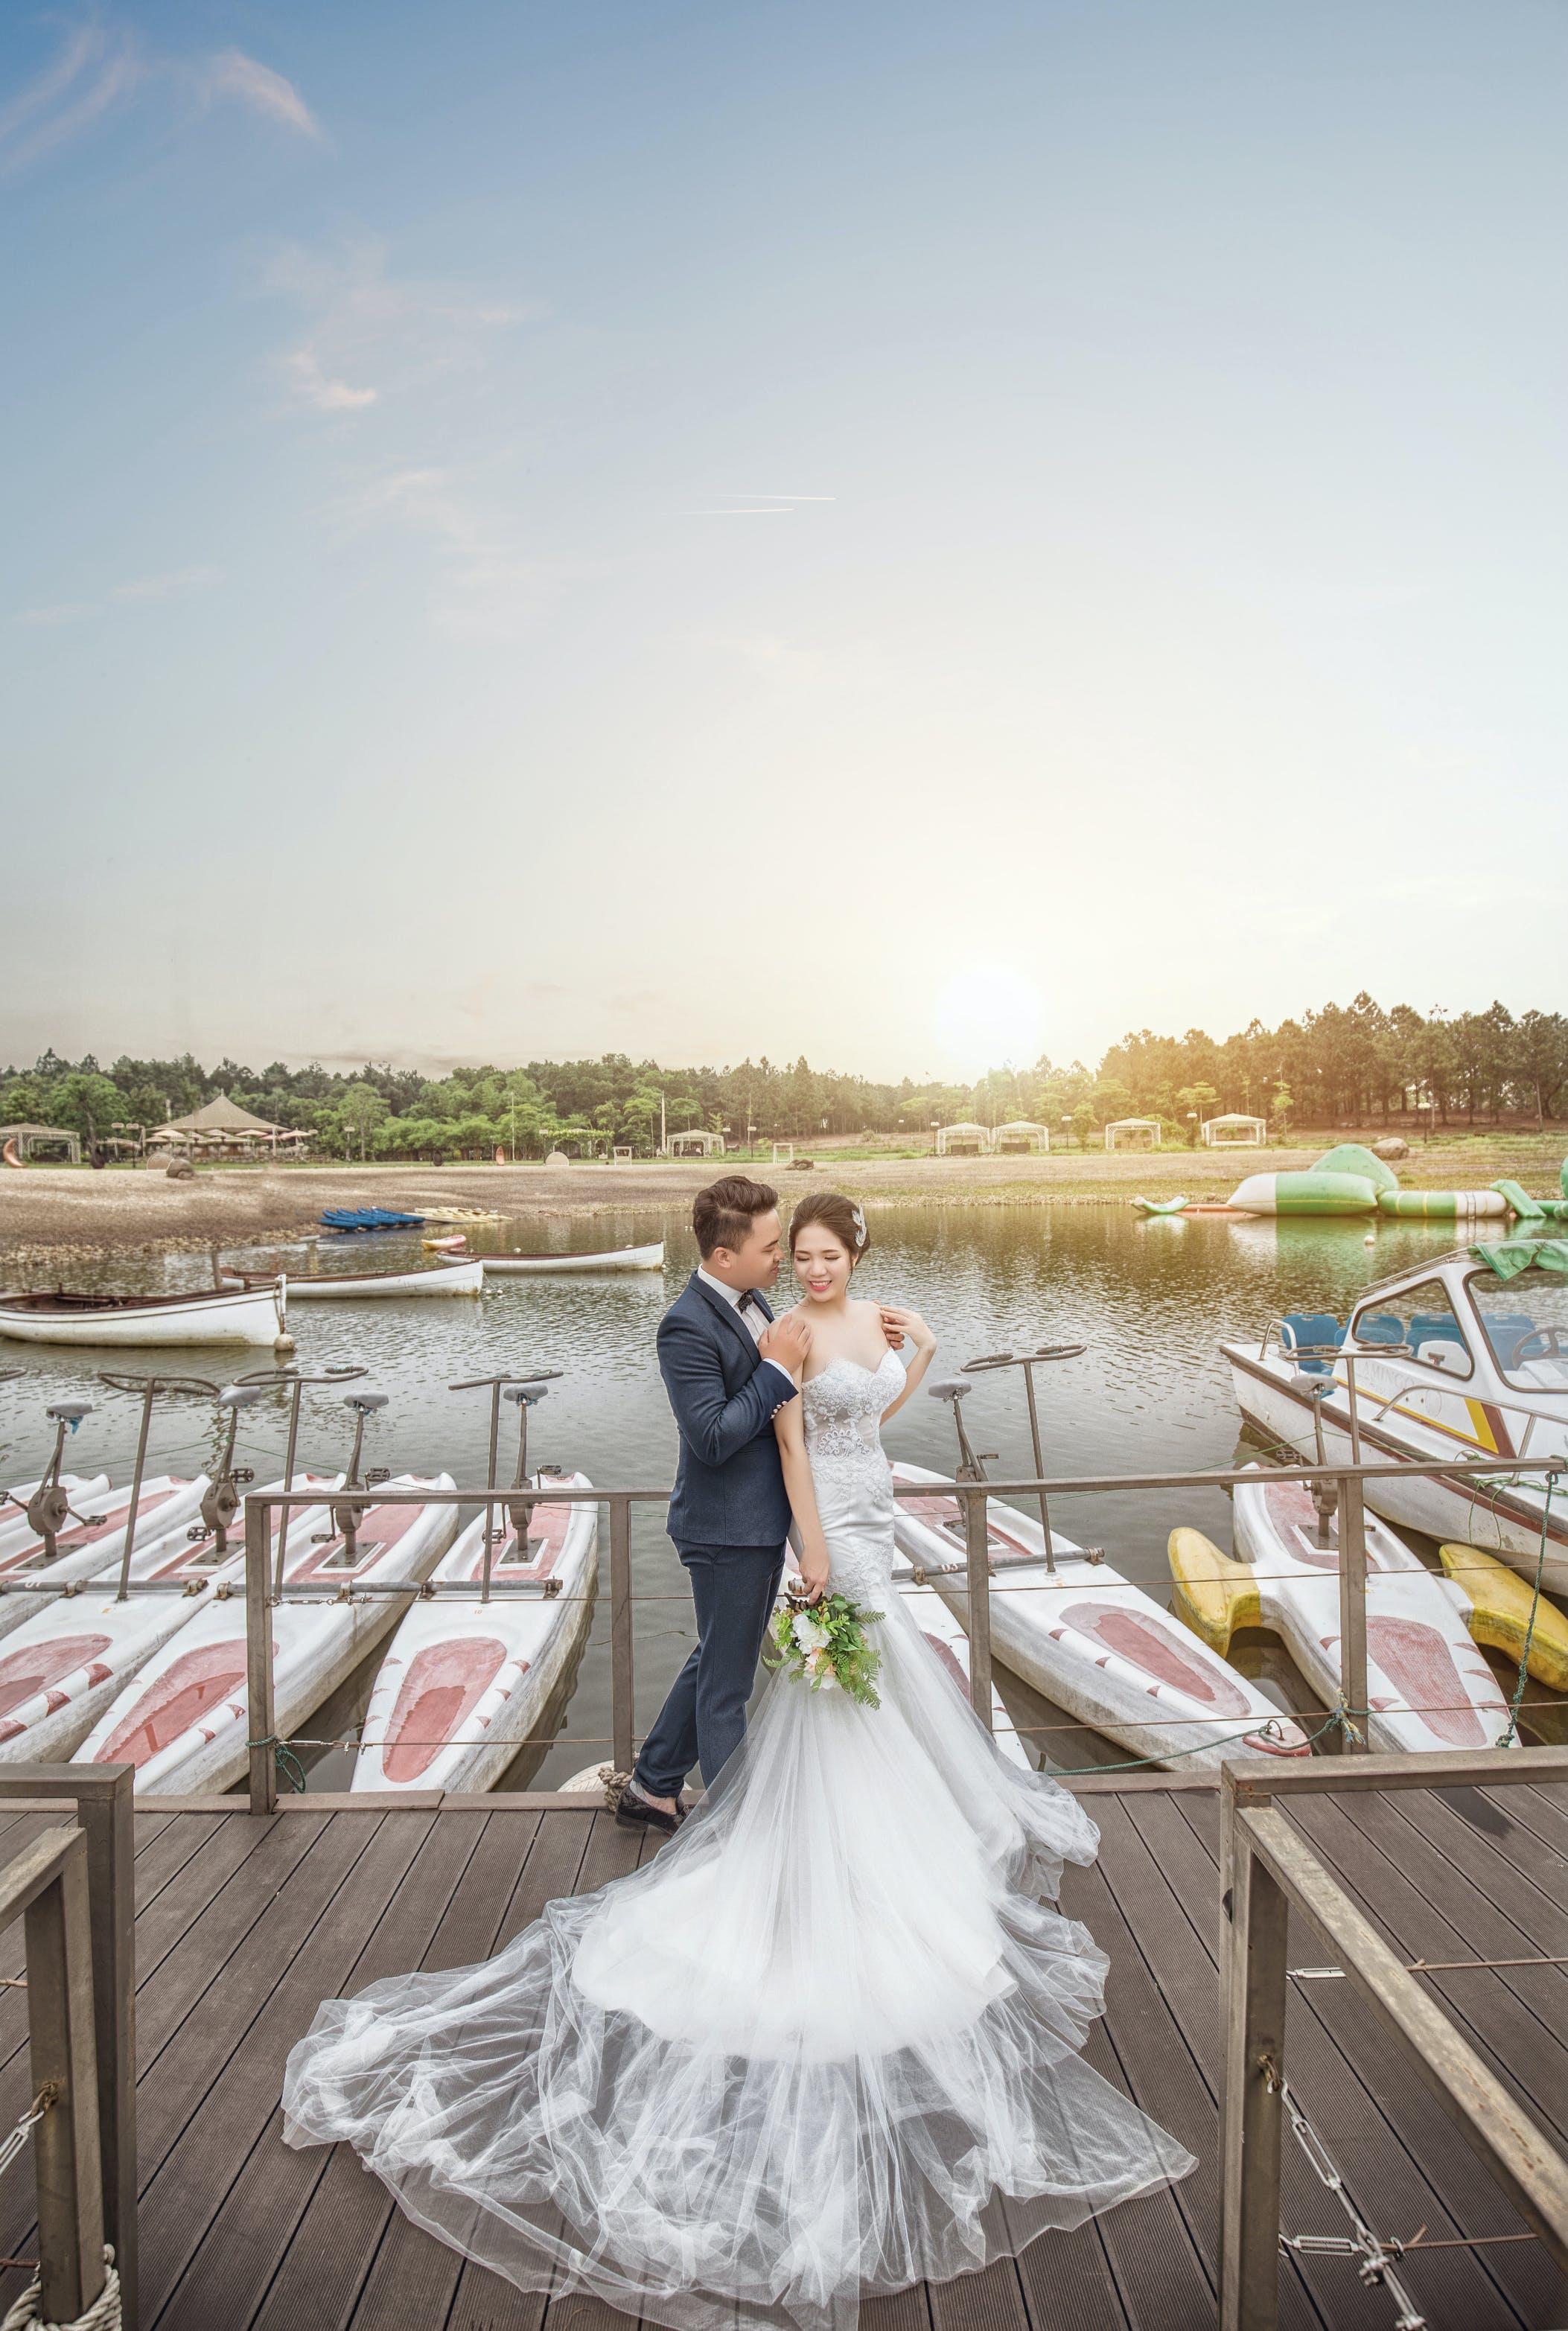 Free stock photo of wedding, bride, wedding ring, honeymoon